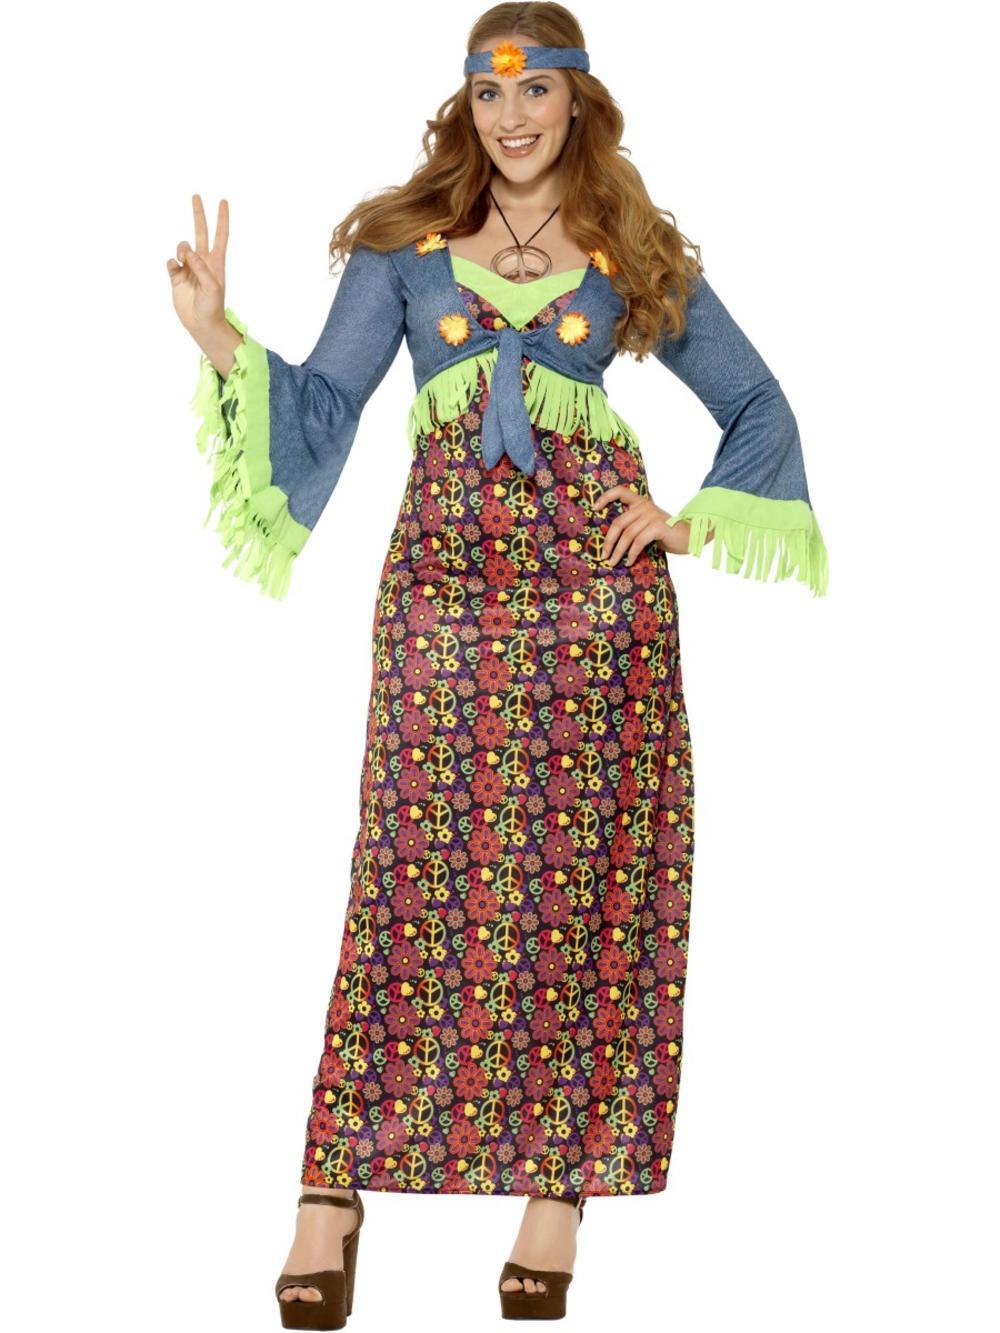 Hippie Ladies Fancy Dress 1970s 60s Hippy Peace Womens Adults Costume Plus Size